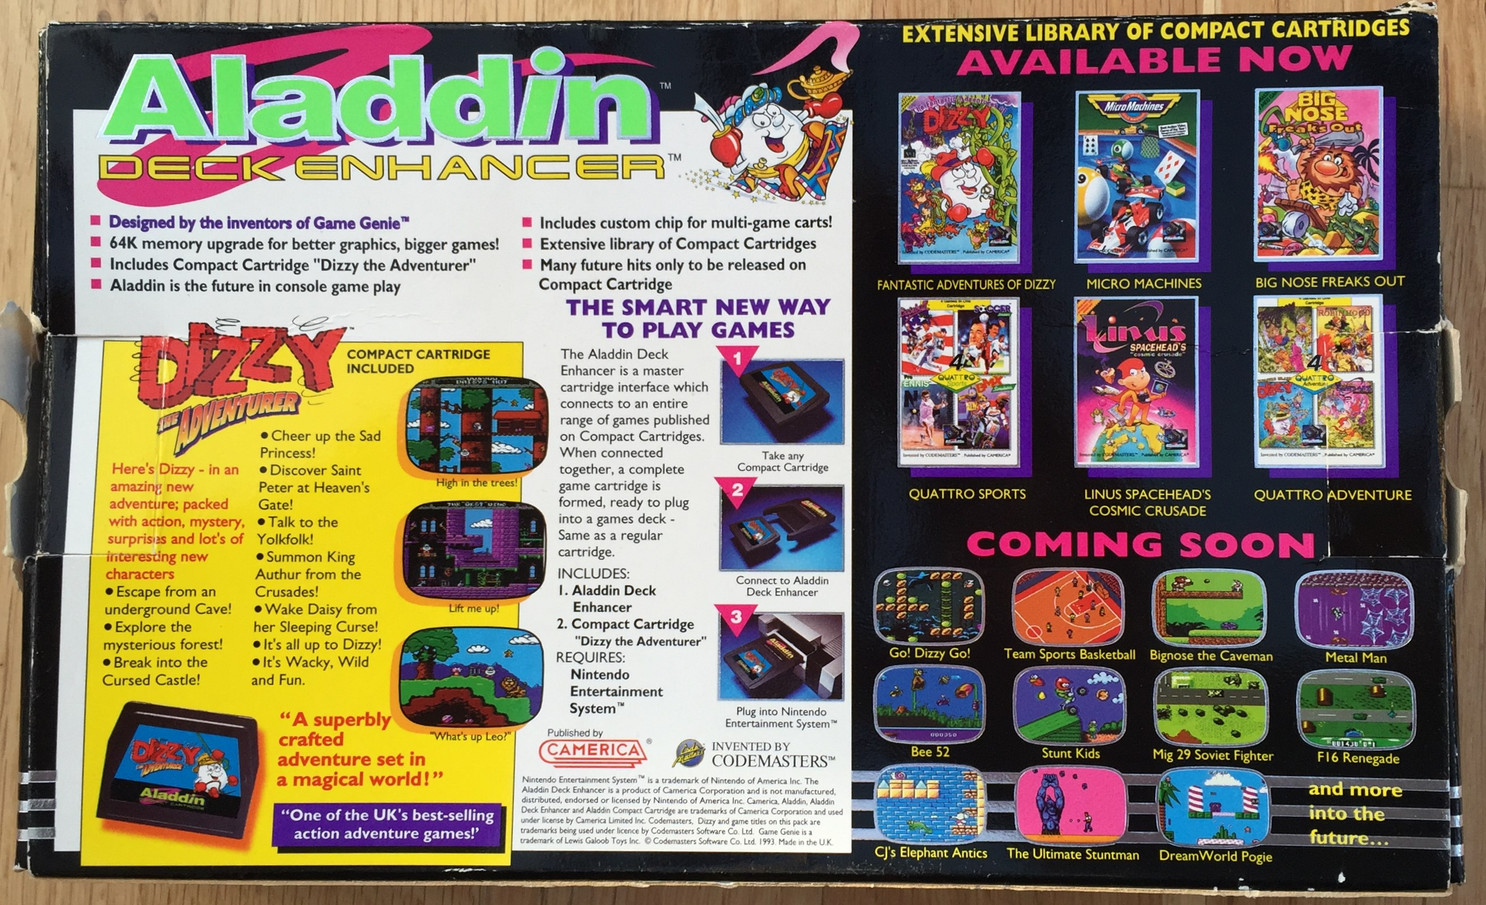 AladdinBoxBack.jpg